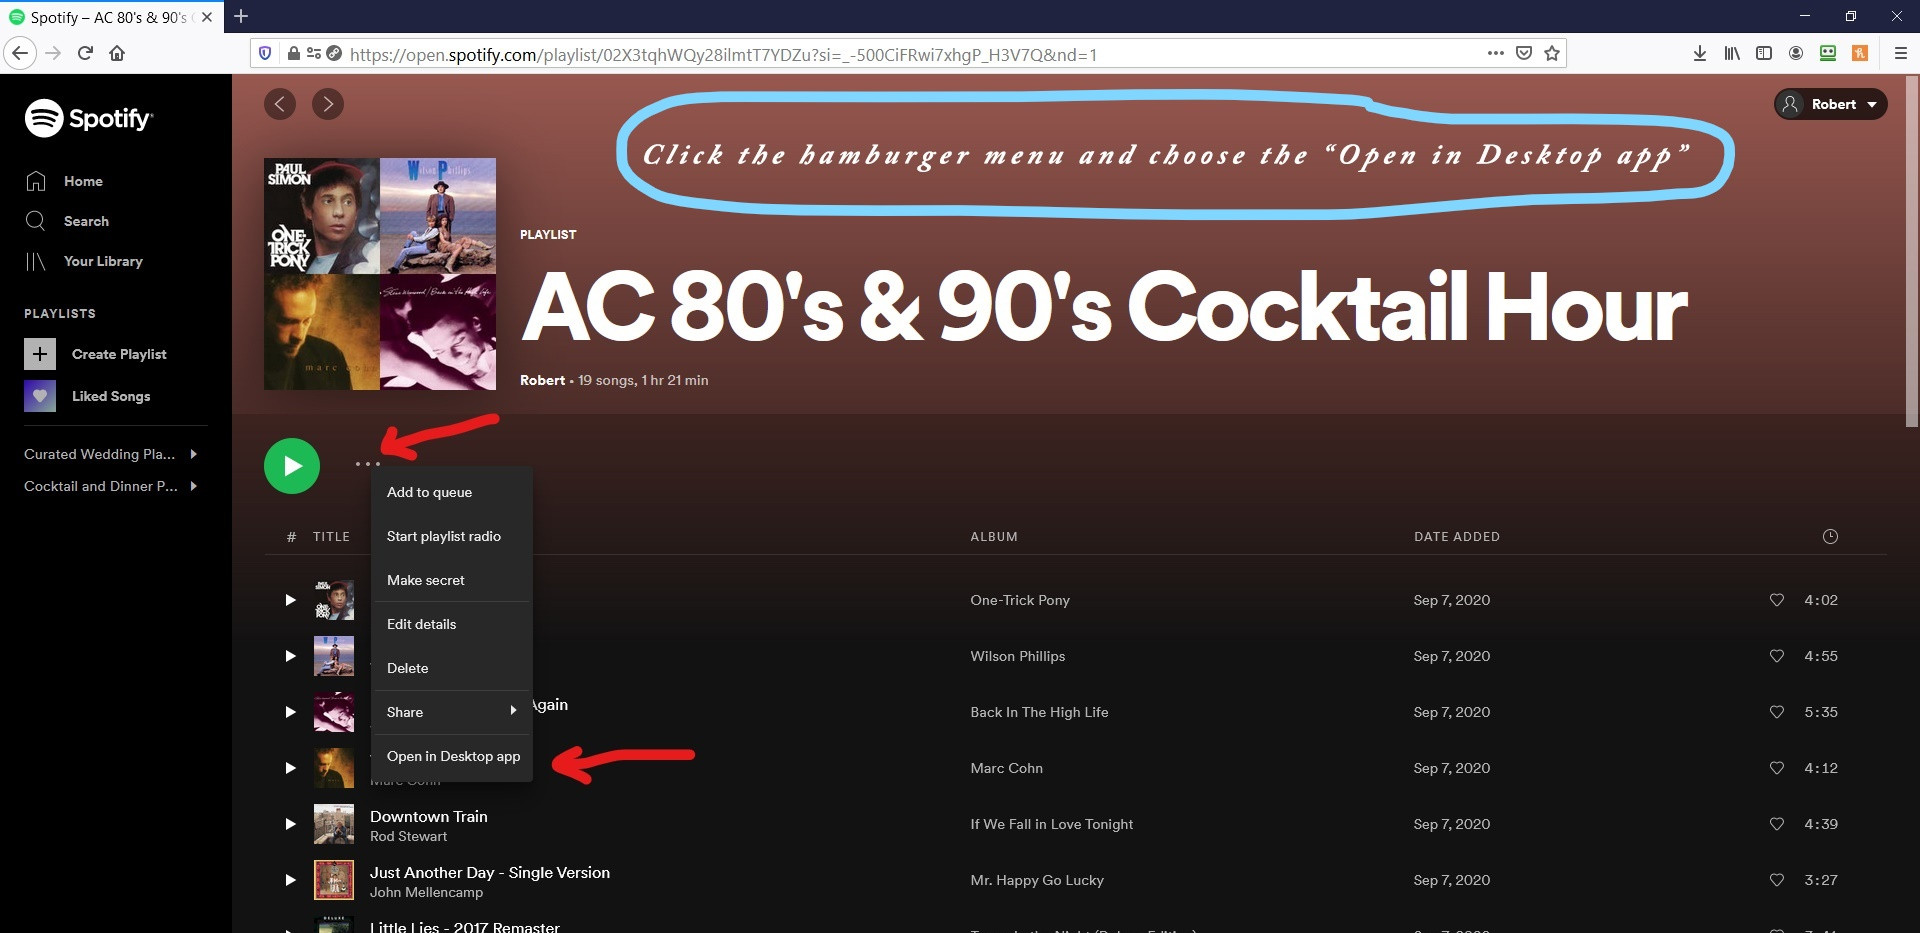 Spotify Website Playlist Page Post-Login